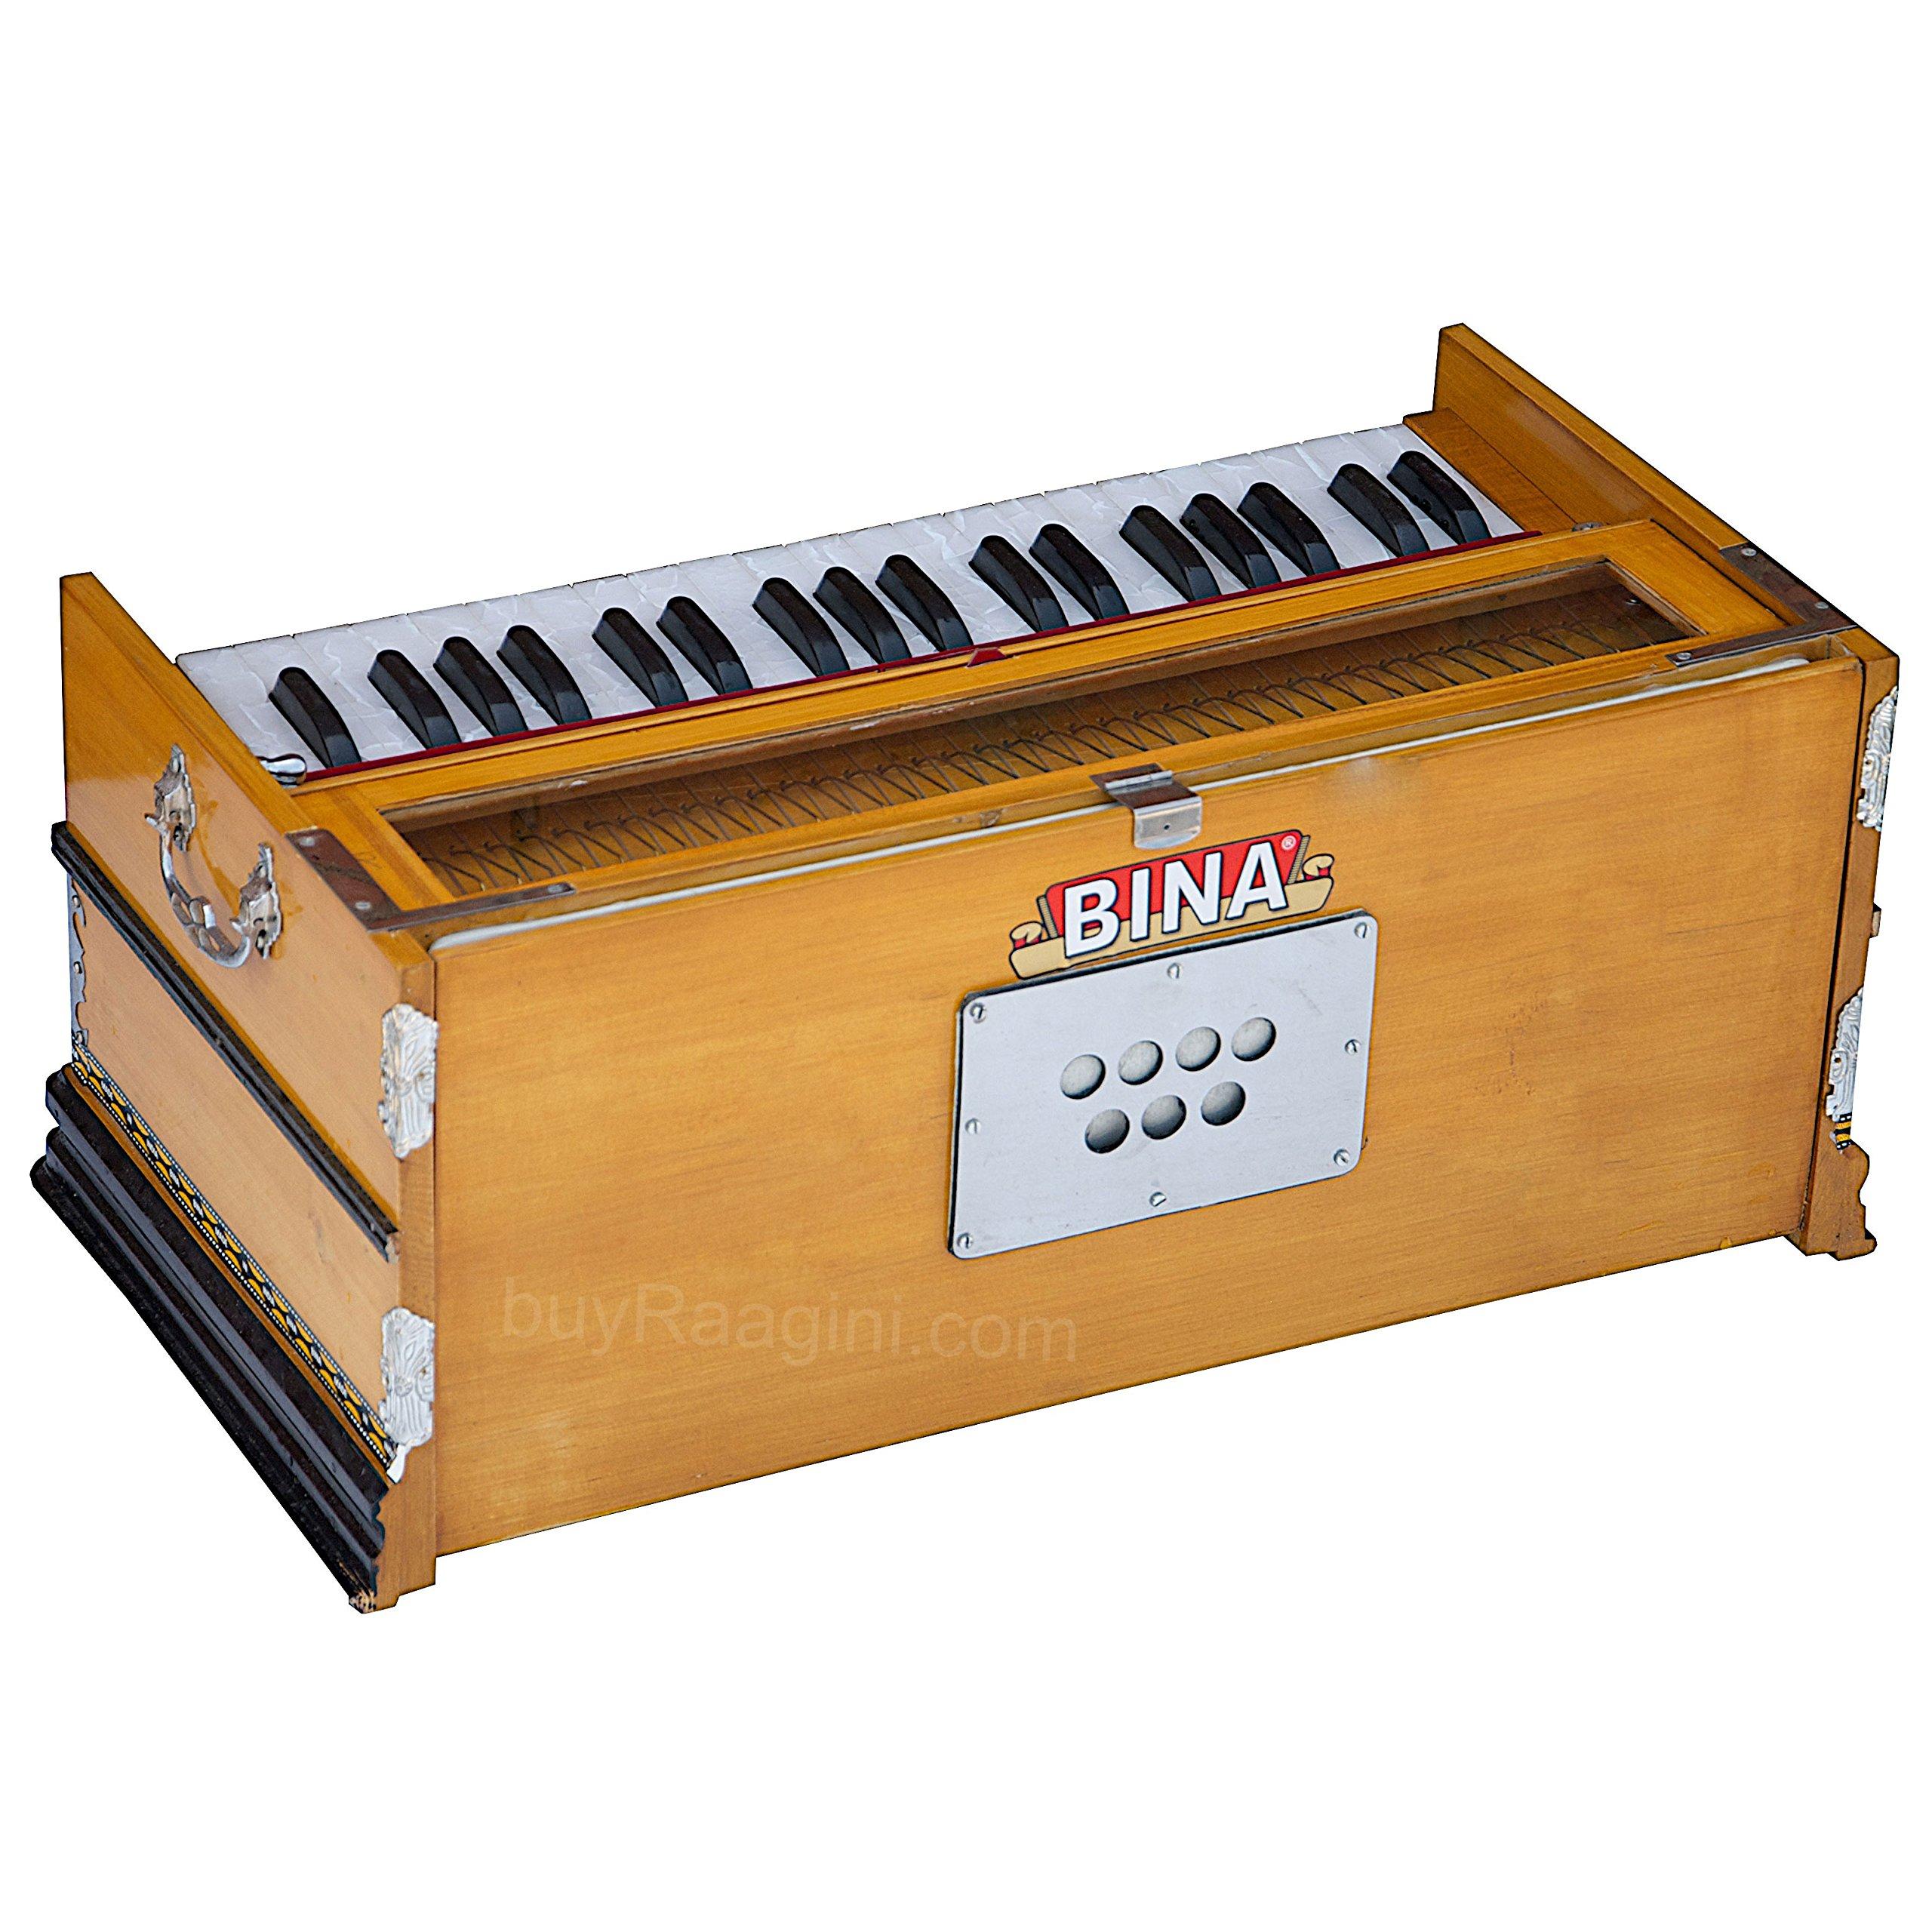 Harmonium Musical Instrument, BINA No. 8, 7 Stops, 3 1/4 Octaves, Coupler, Tuned To A400, Double Reed, Natural Color, Book, Nylon Bag (PDI-DJF) by Bina (Image #3)